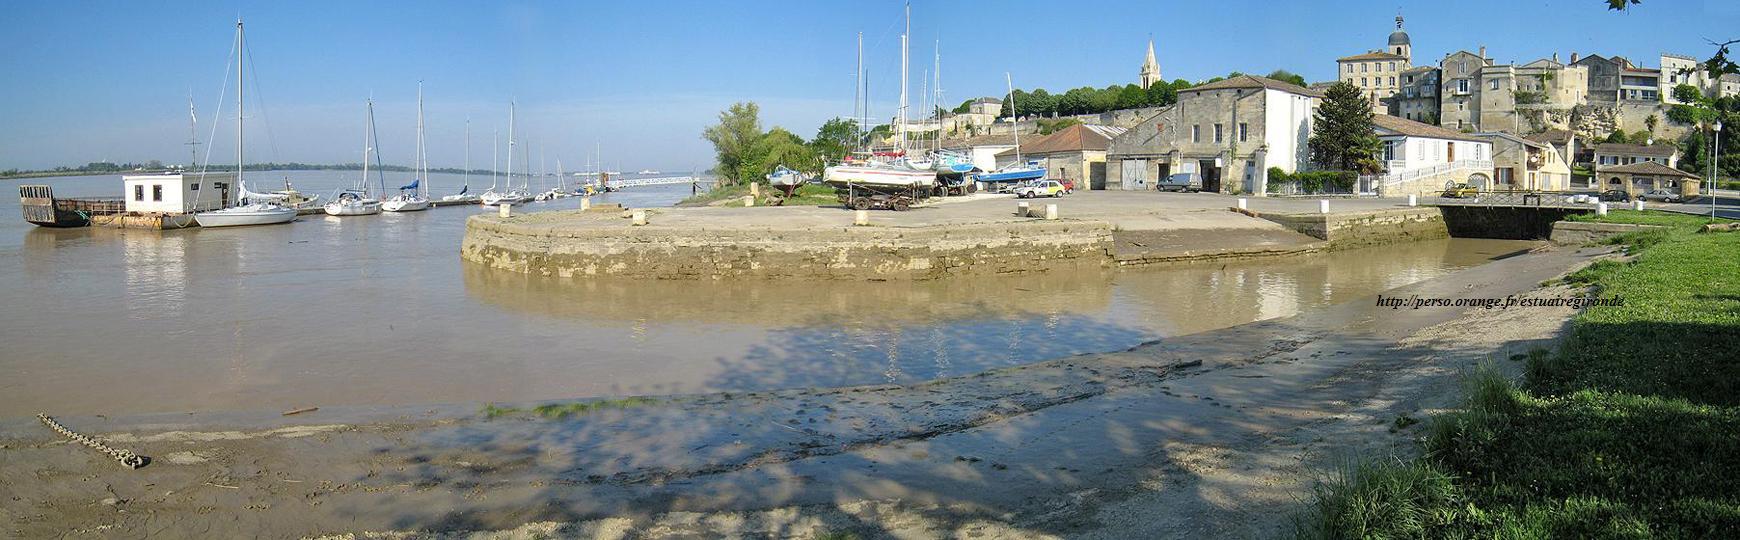 port bourg sur gironde...